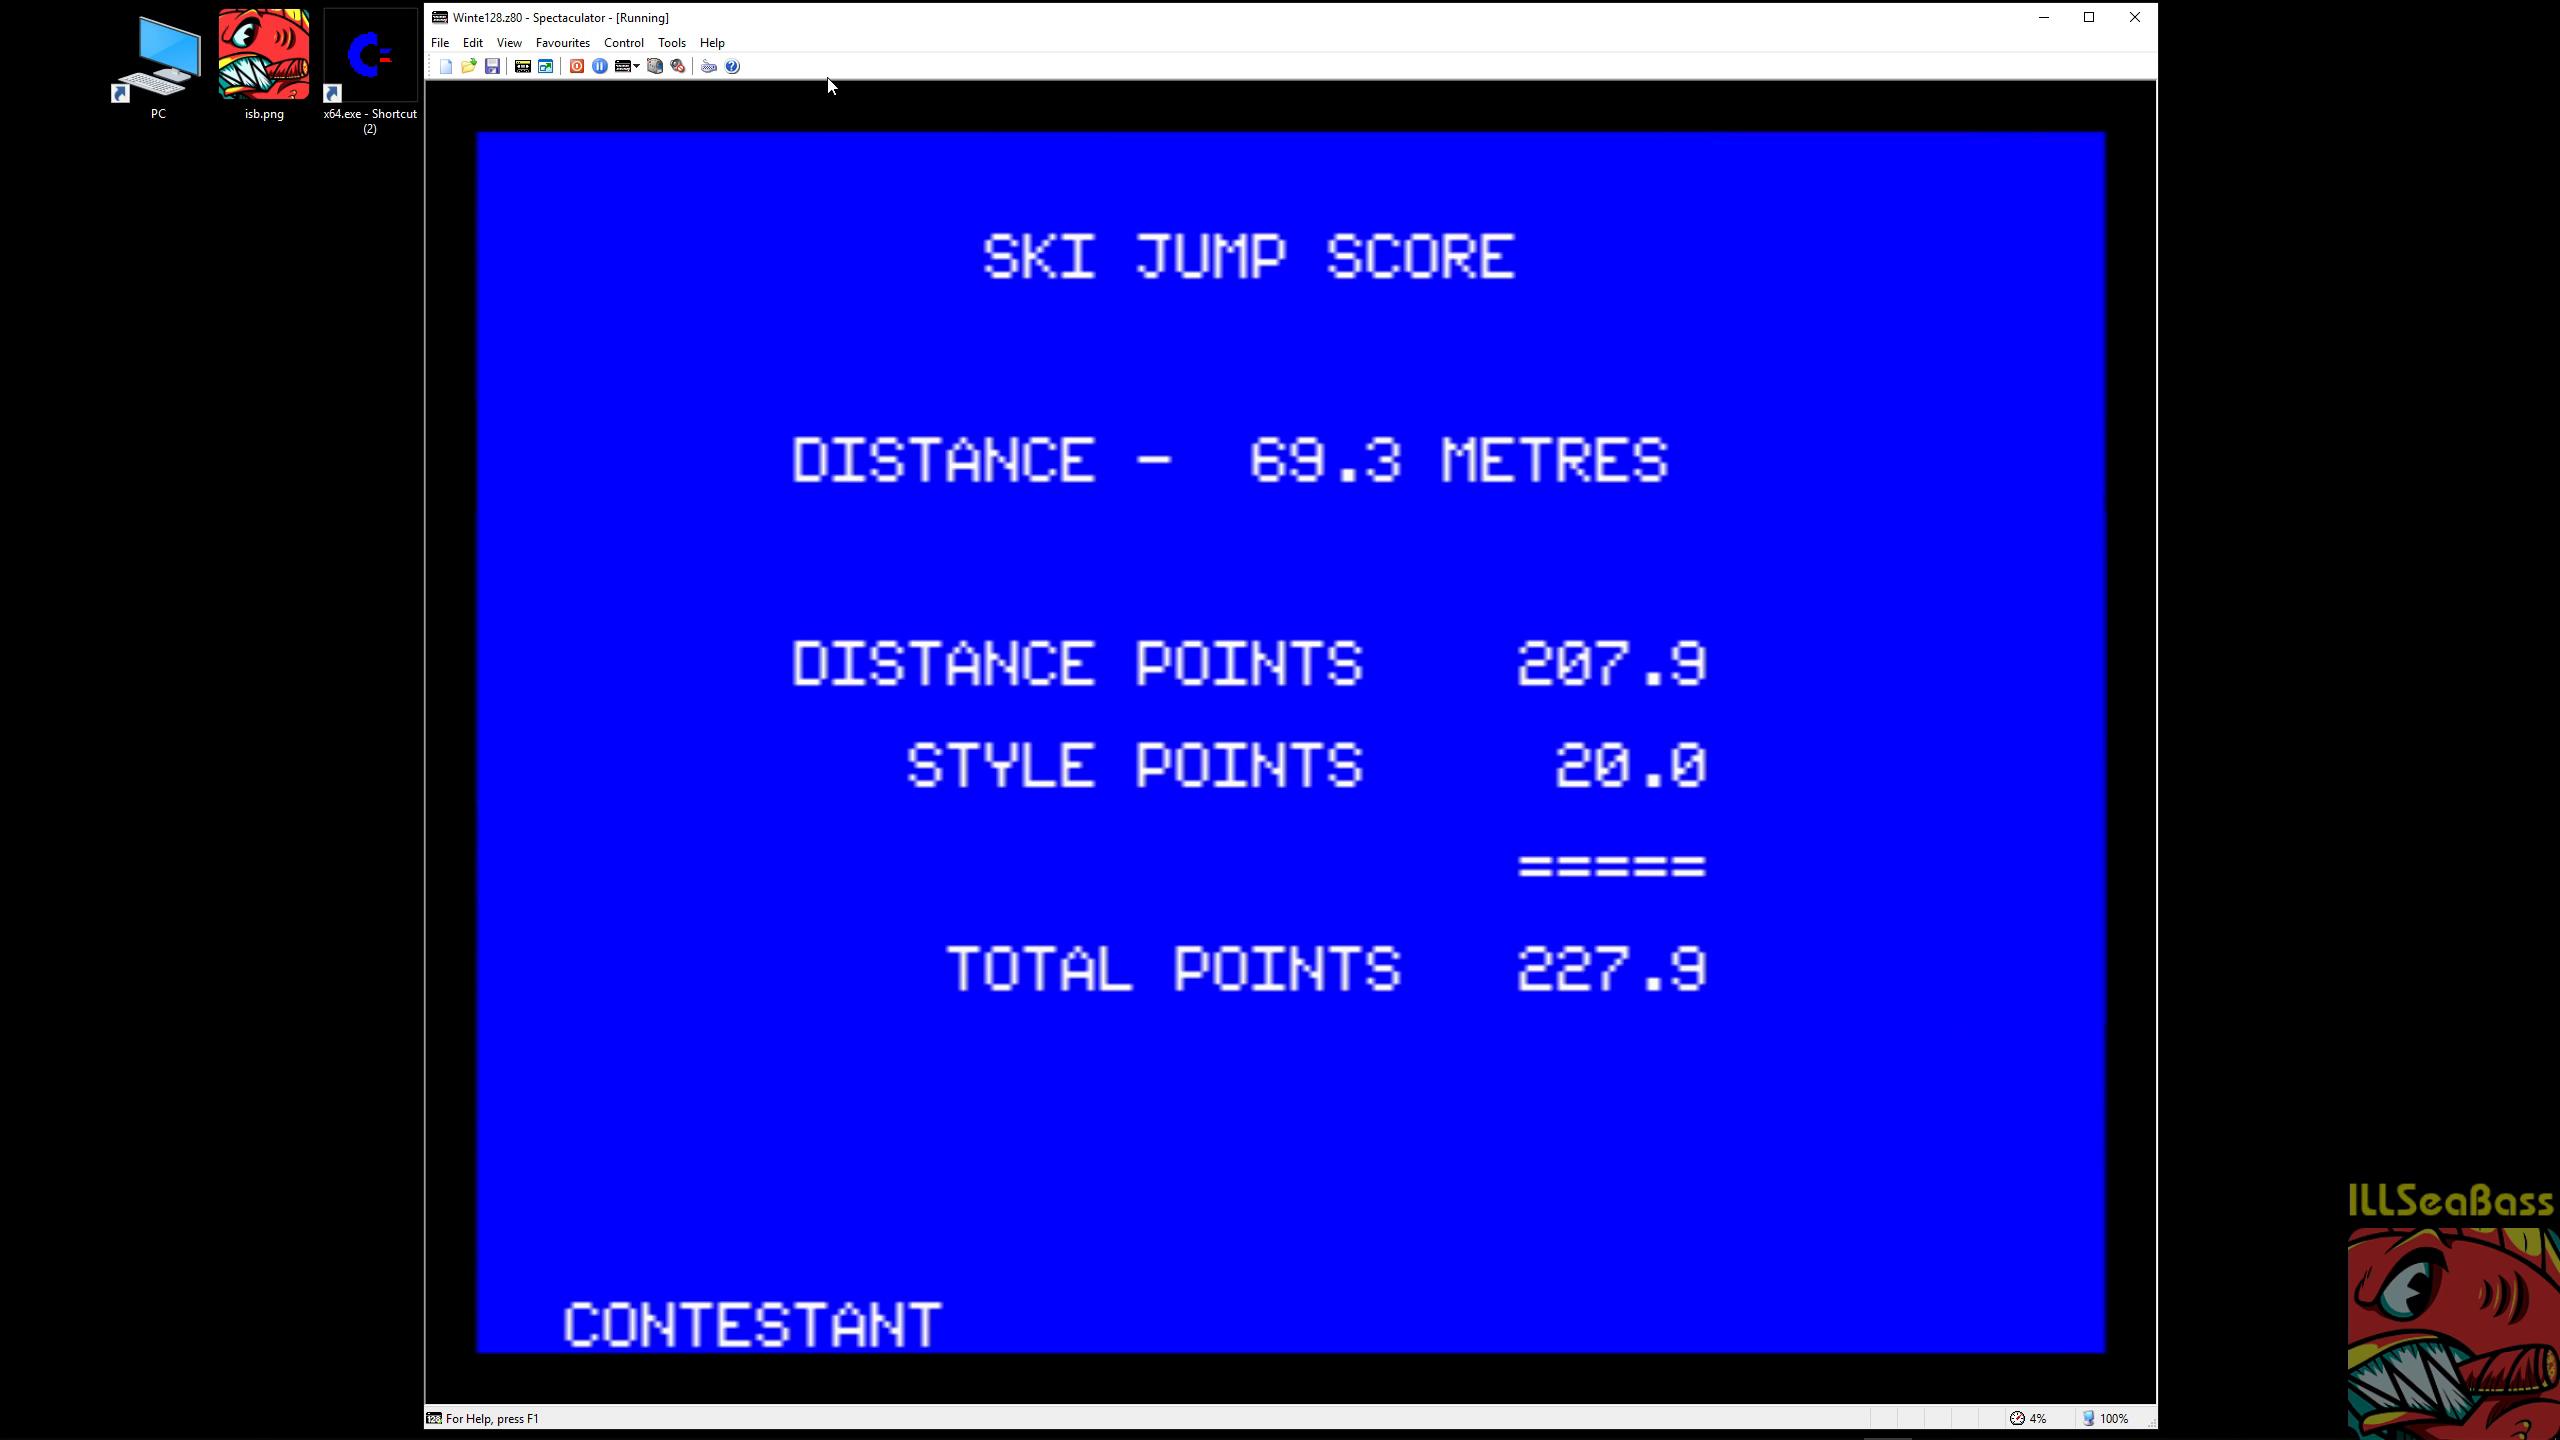 ILLSeaBass: Winter Games [Ski Jump] [Score * 10] (ZX Spectrum Emulated) 2,279 points on 2019-01-06 13:02:37